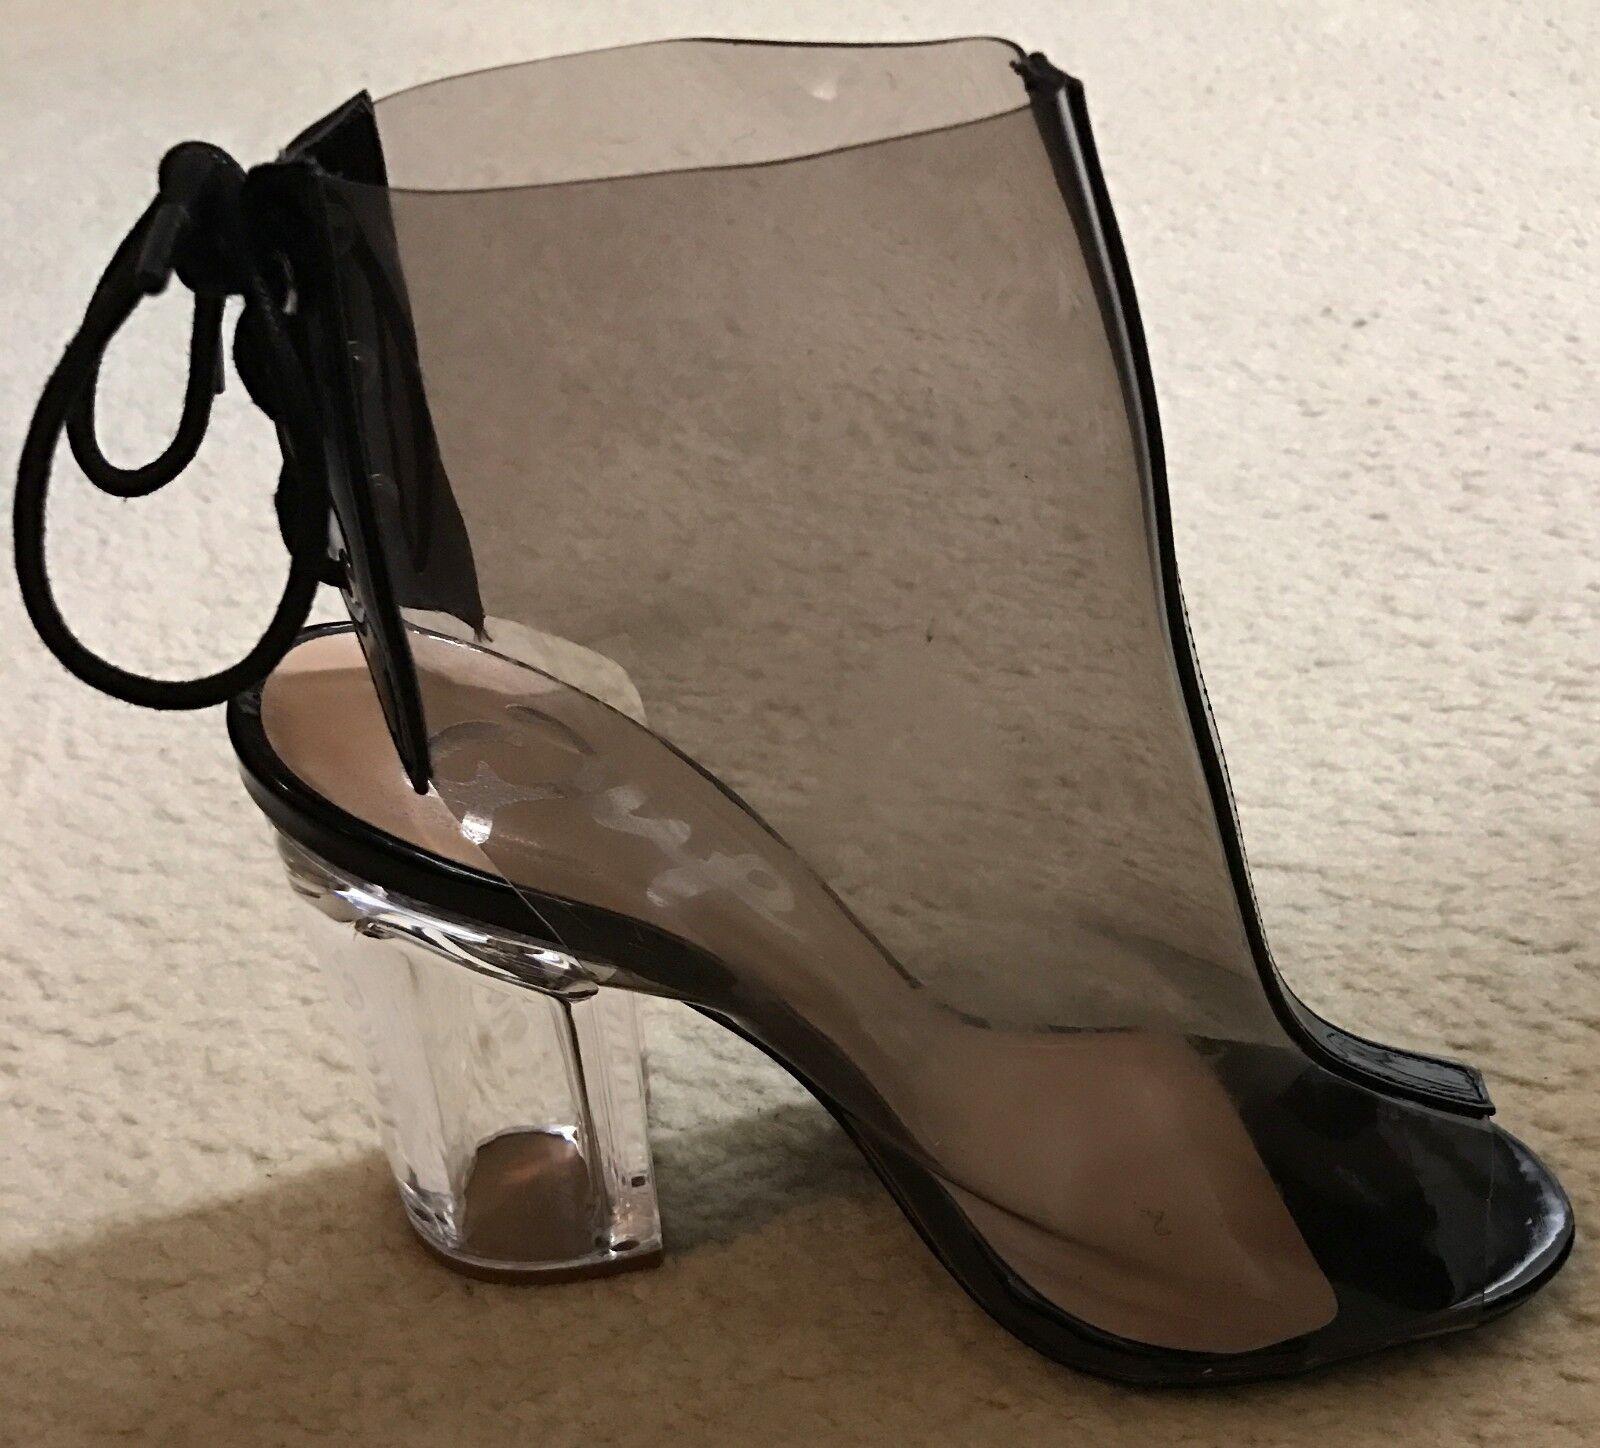 Womens heels size 7.5 Qupid grey clear 4 inch heel